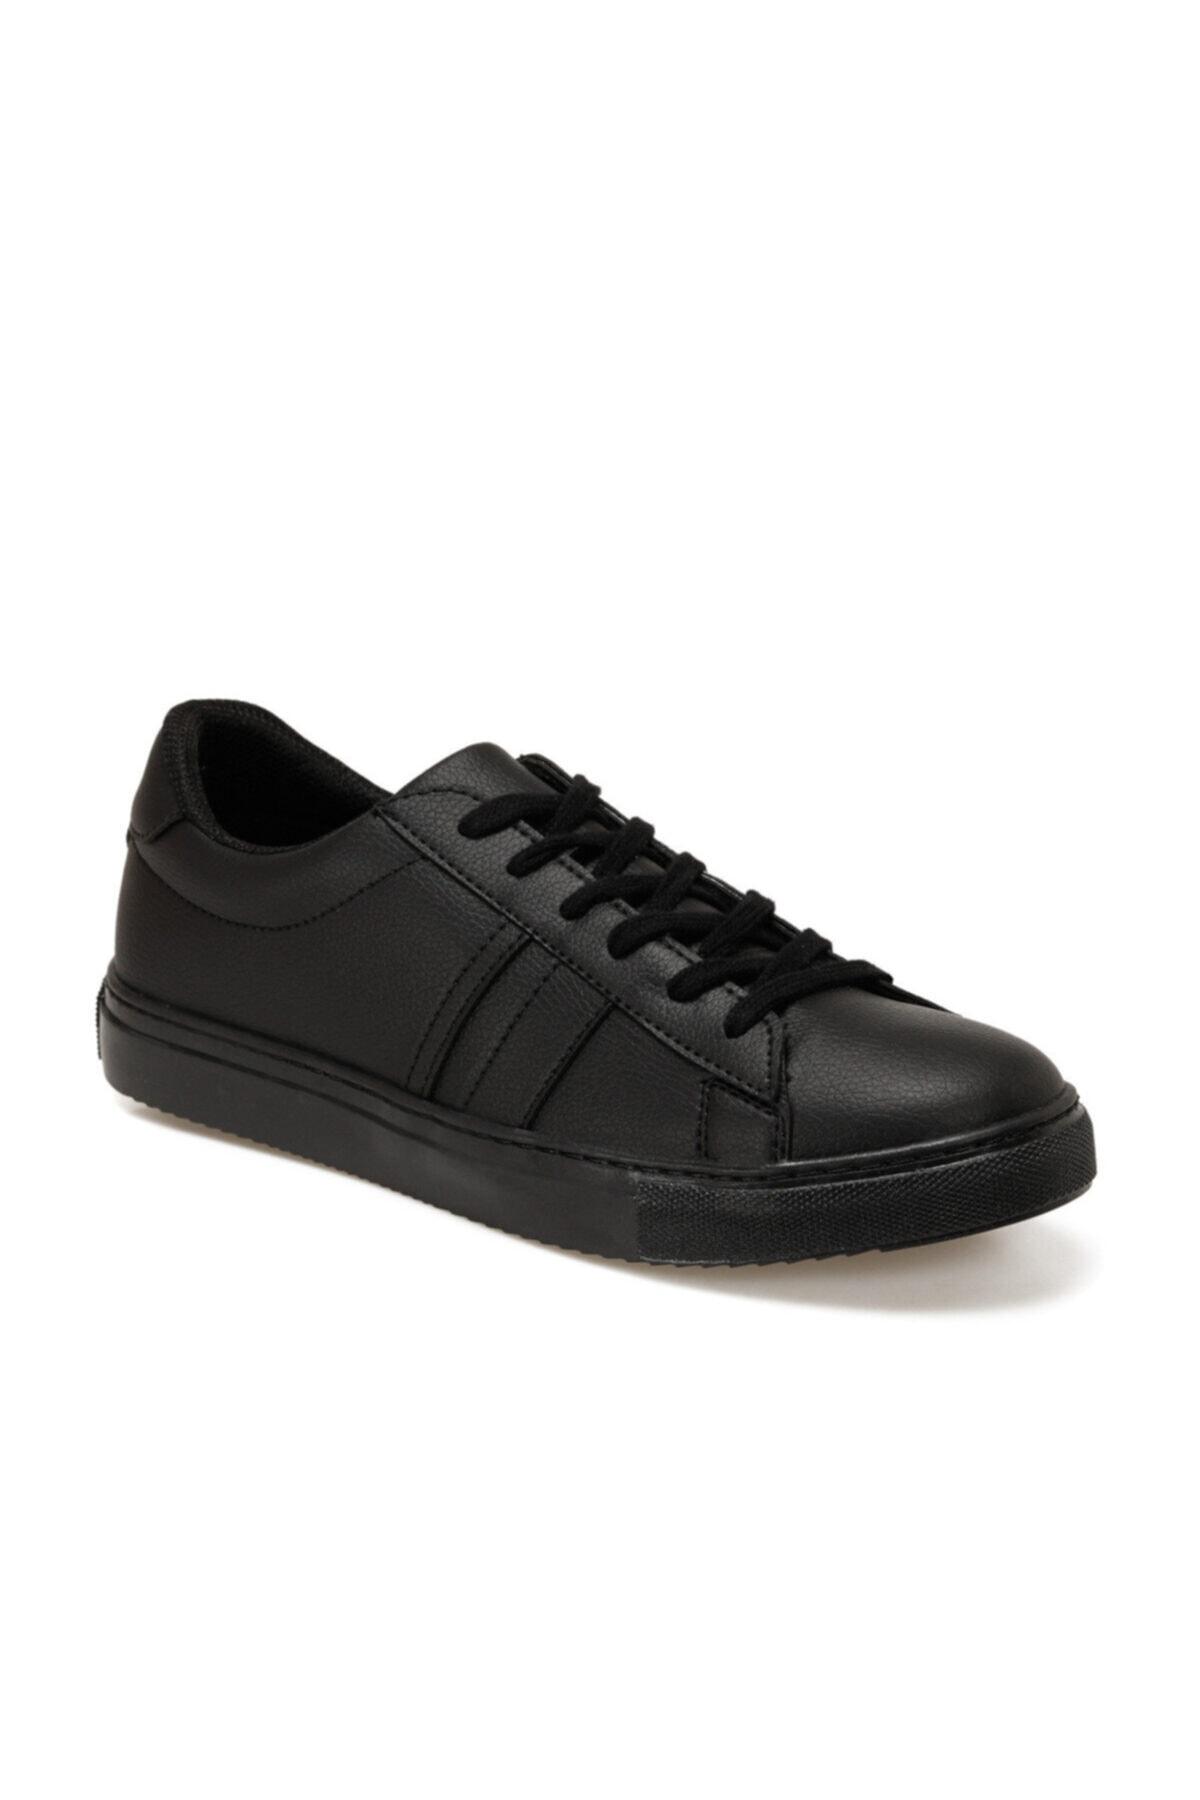 PANAMA CLUB Erkek Siyah  Ayakkabı Yde92-155 1